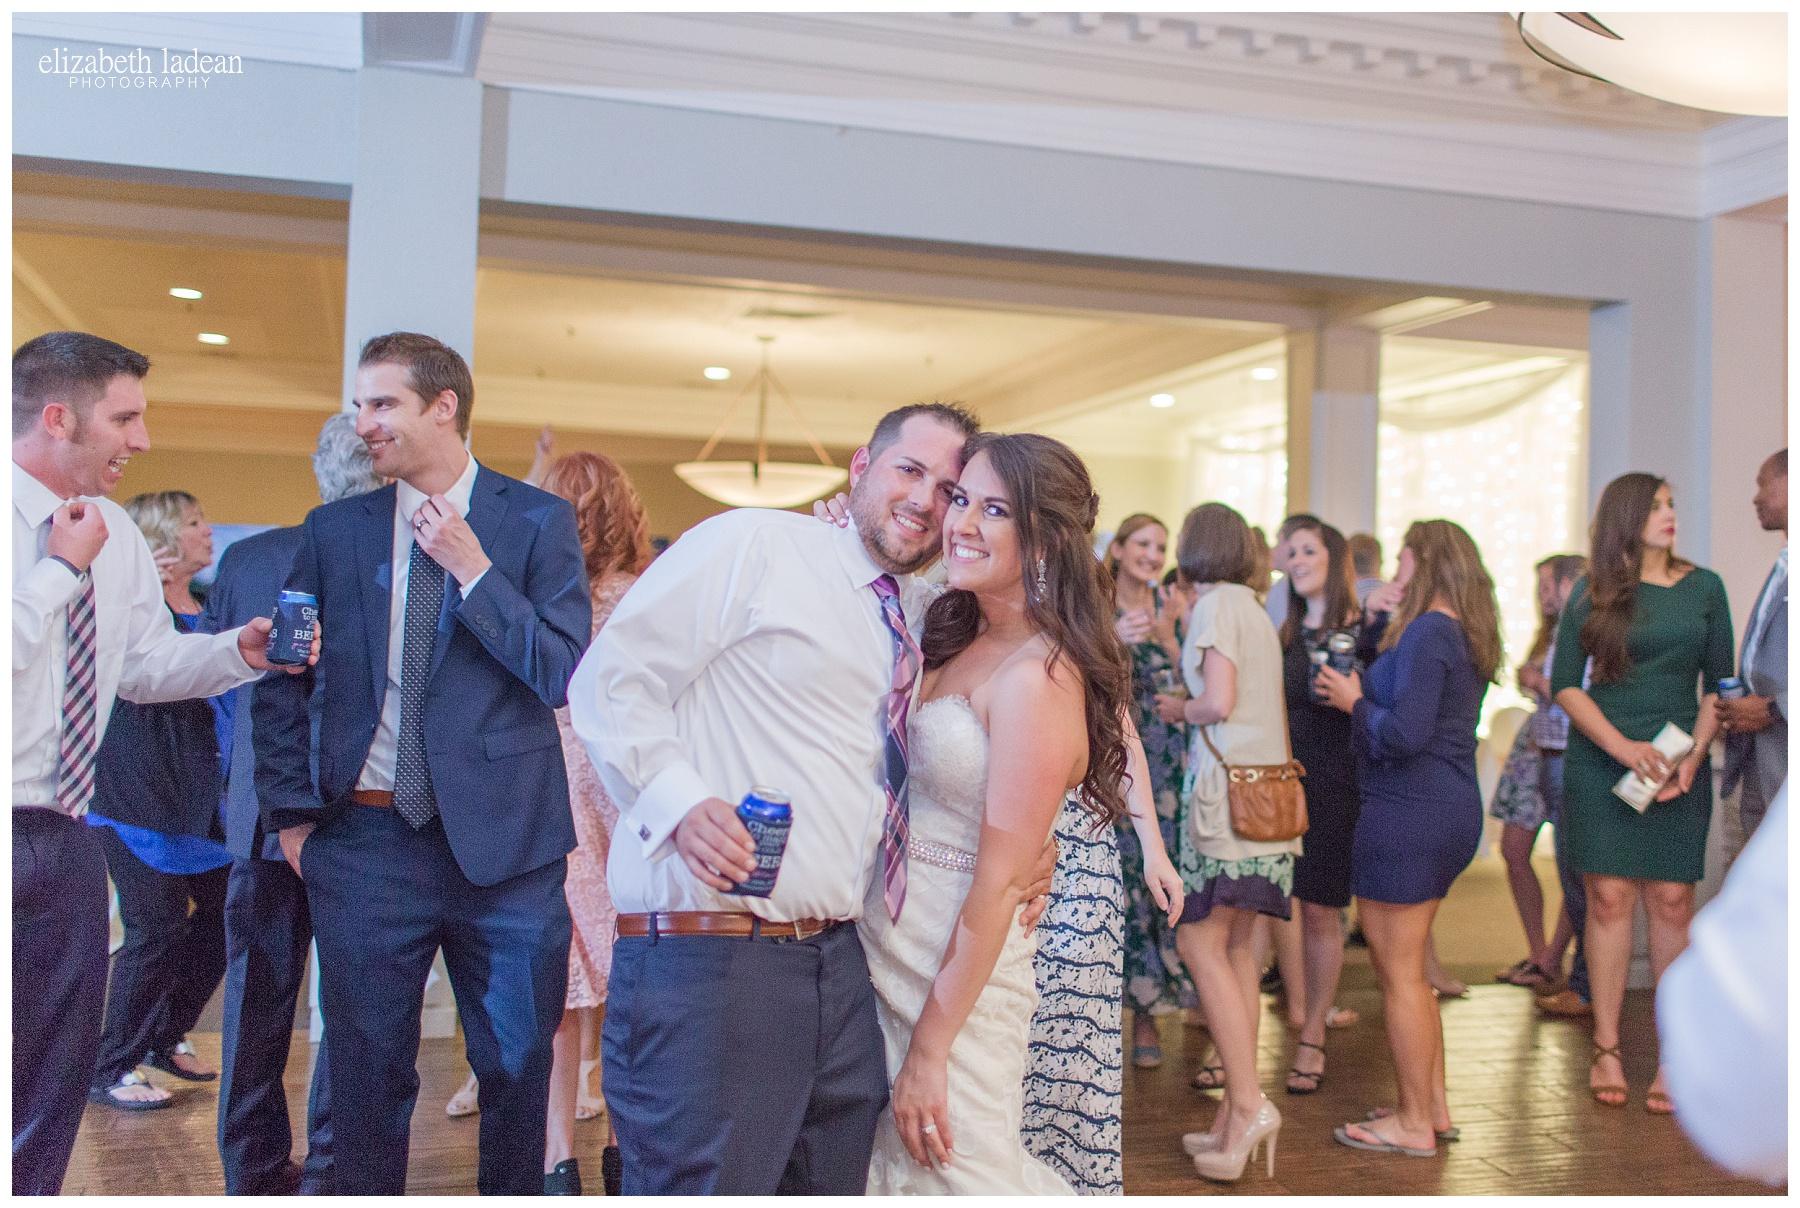 Hillcrest-Country-Club-Kansas-City-Wedding-Photography-E+J-0520-Elizabeth-Ladean-Photography-photo_0895.jpg